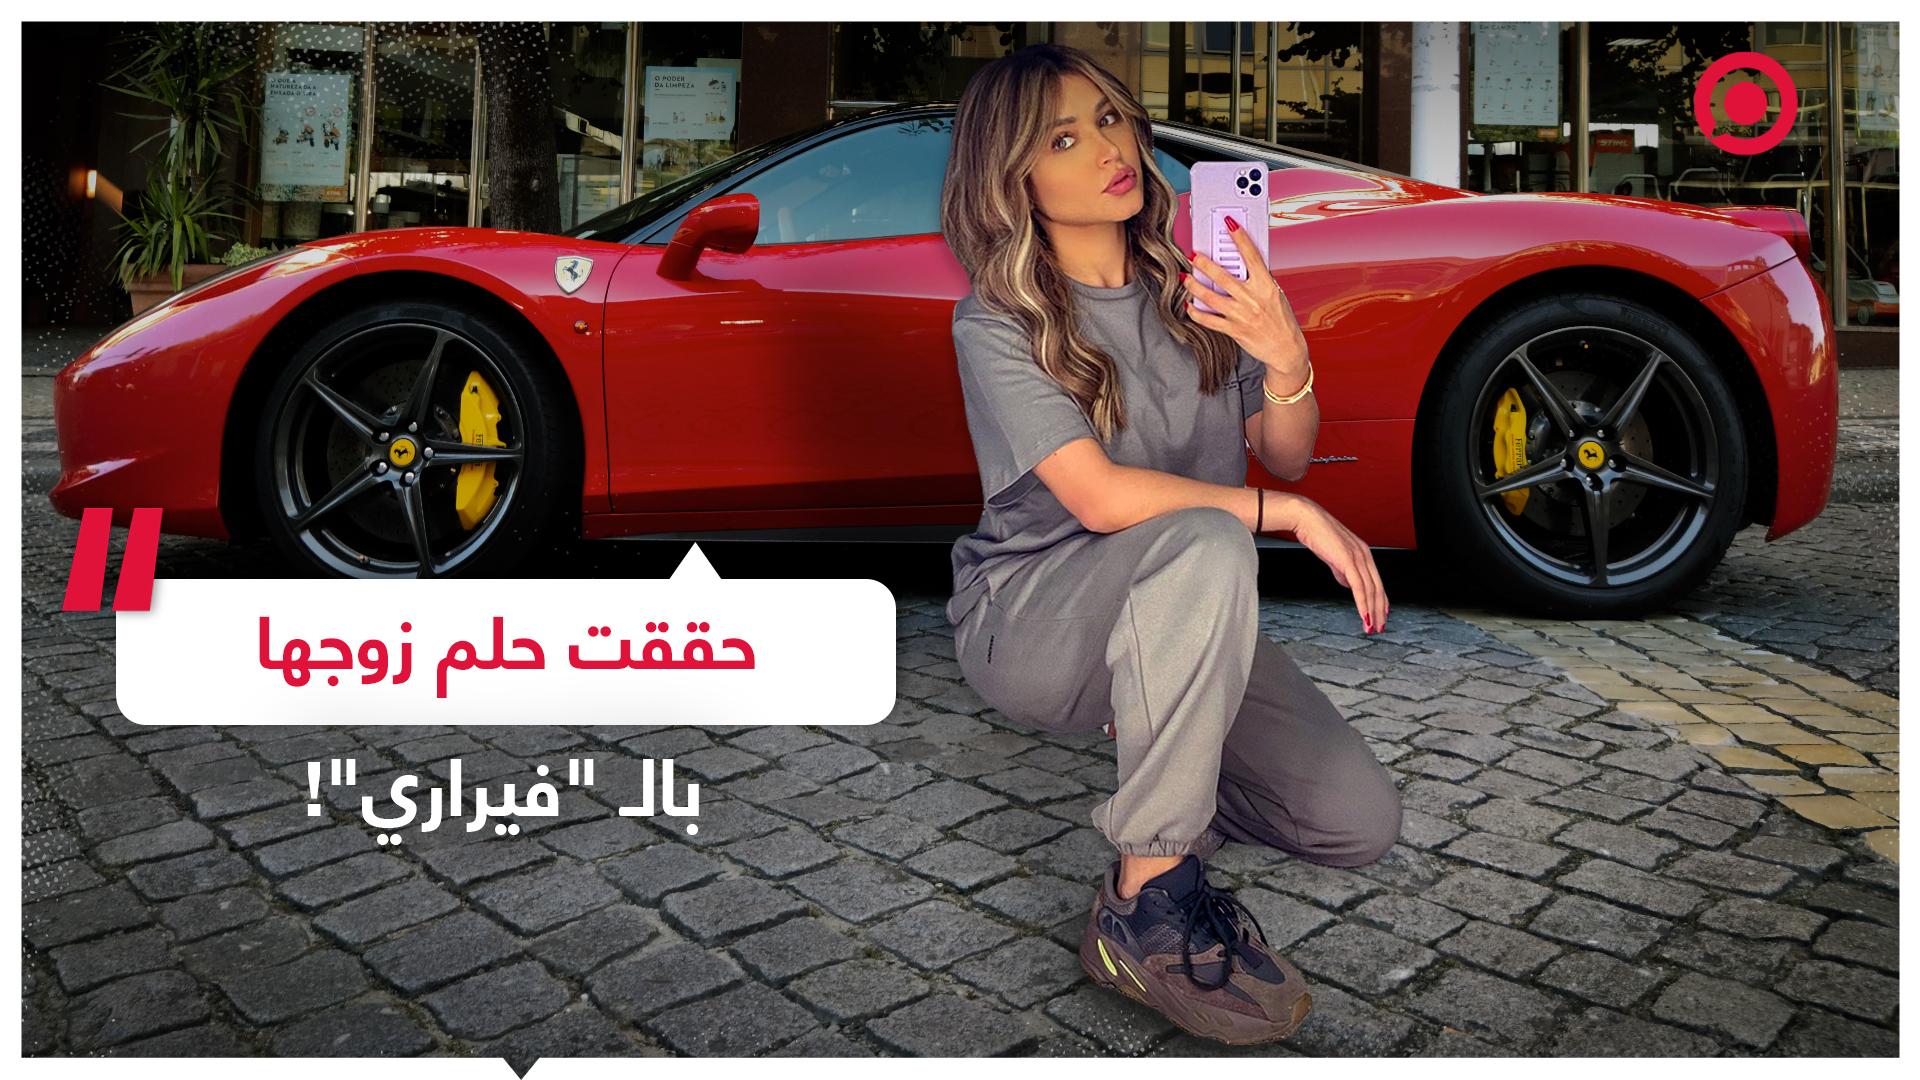 #سيارات #فراري #سناب_شات #مشاهير